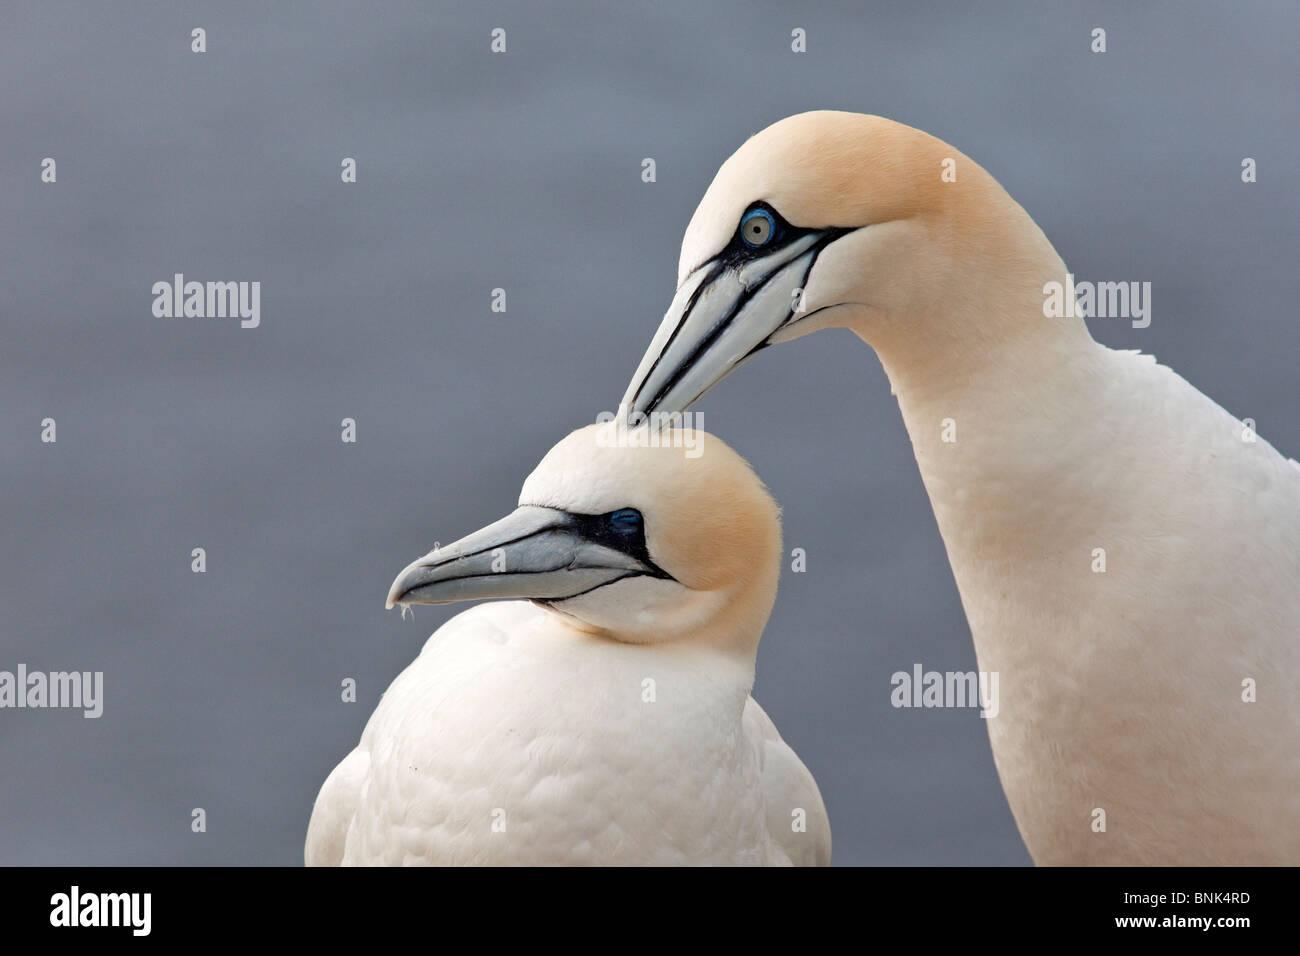 Gannets - Stock Image